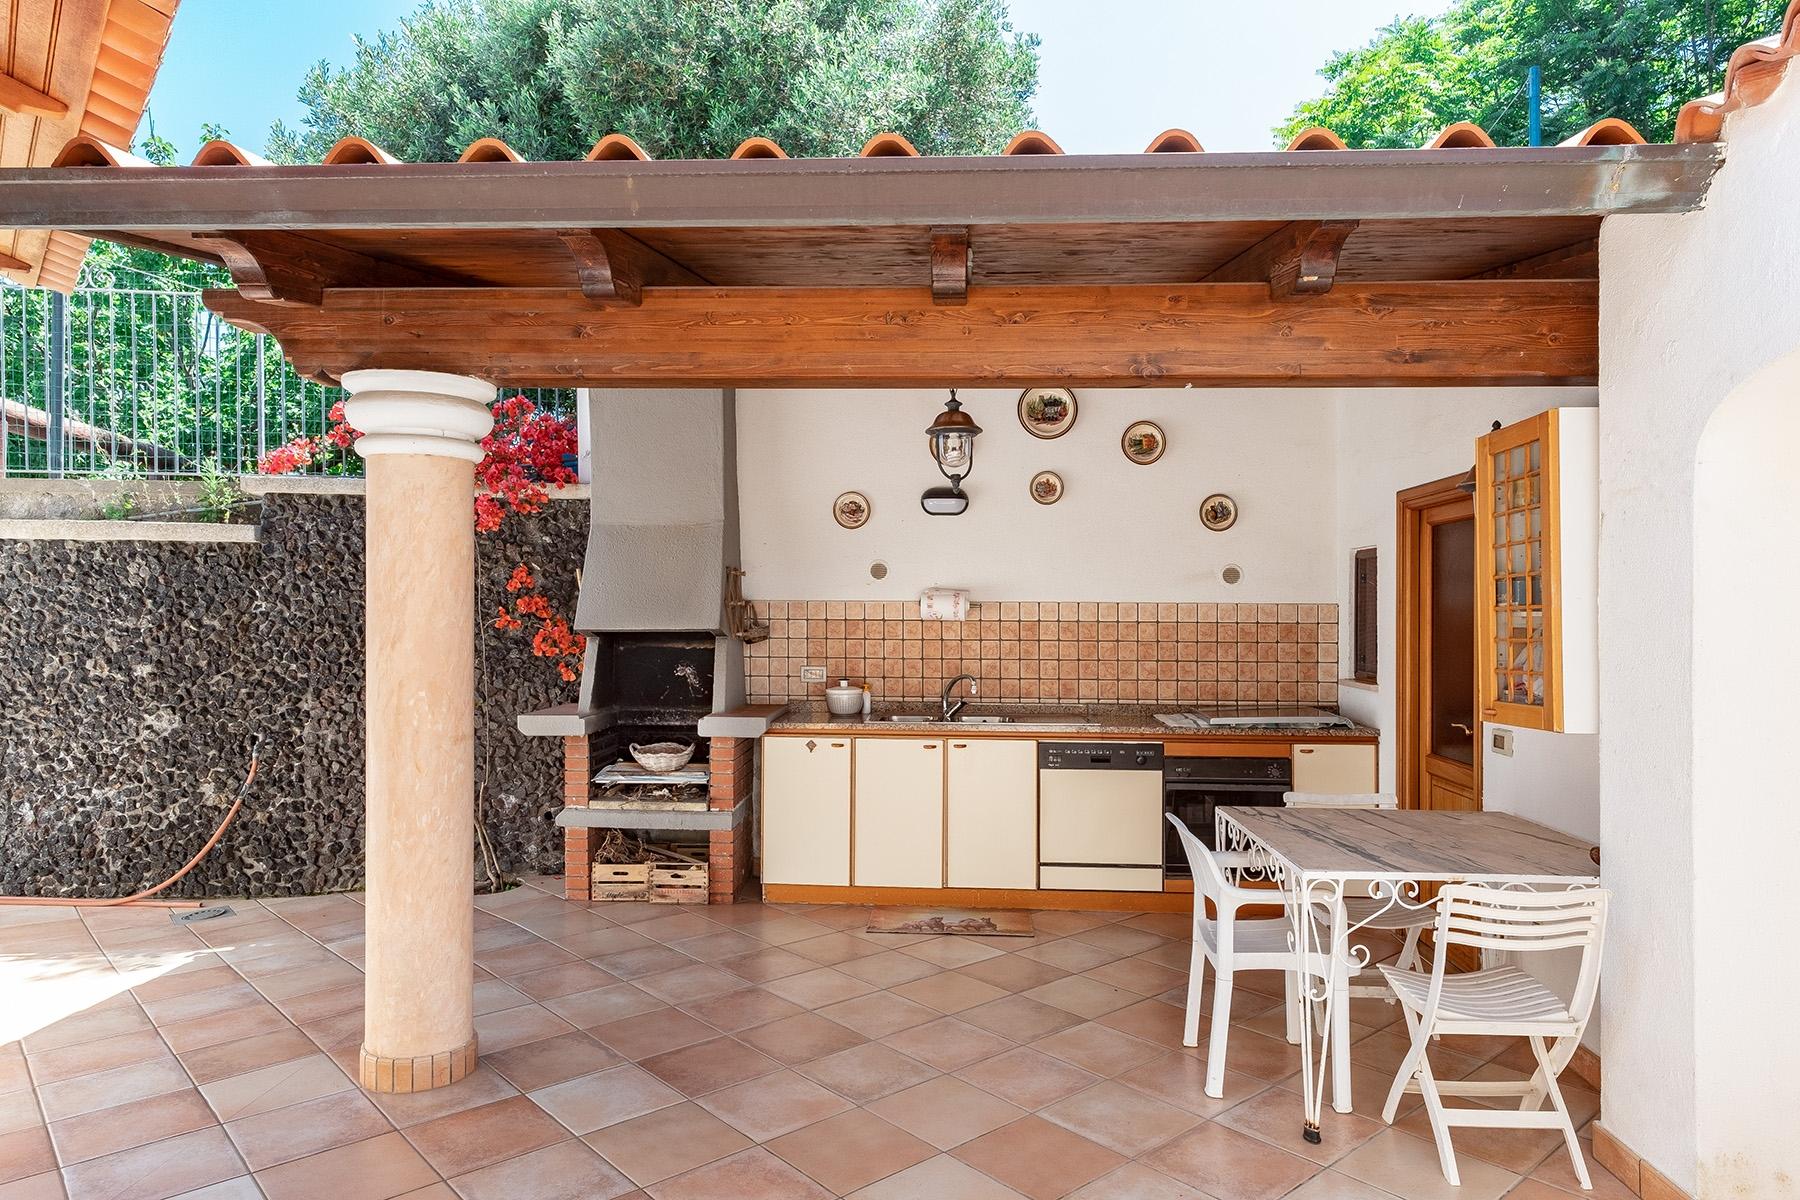 Villa in Vendita a Ischia: 5 locali, 138 mq - Foto 15